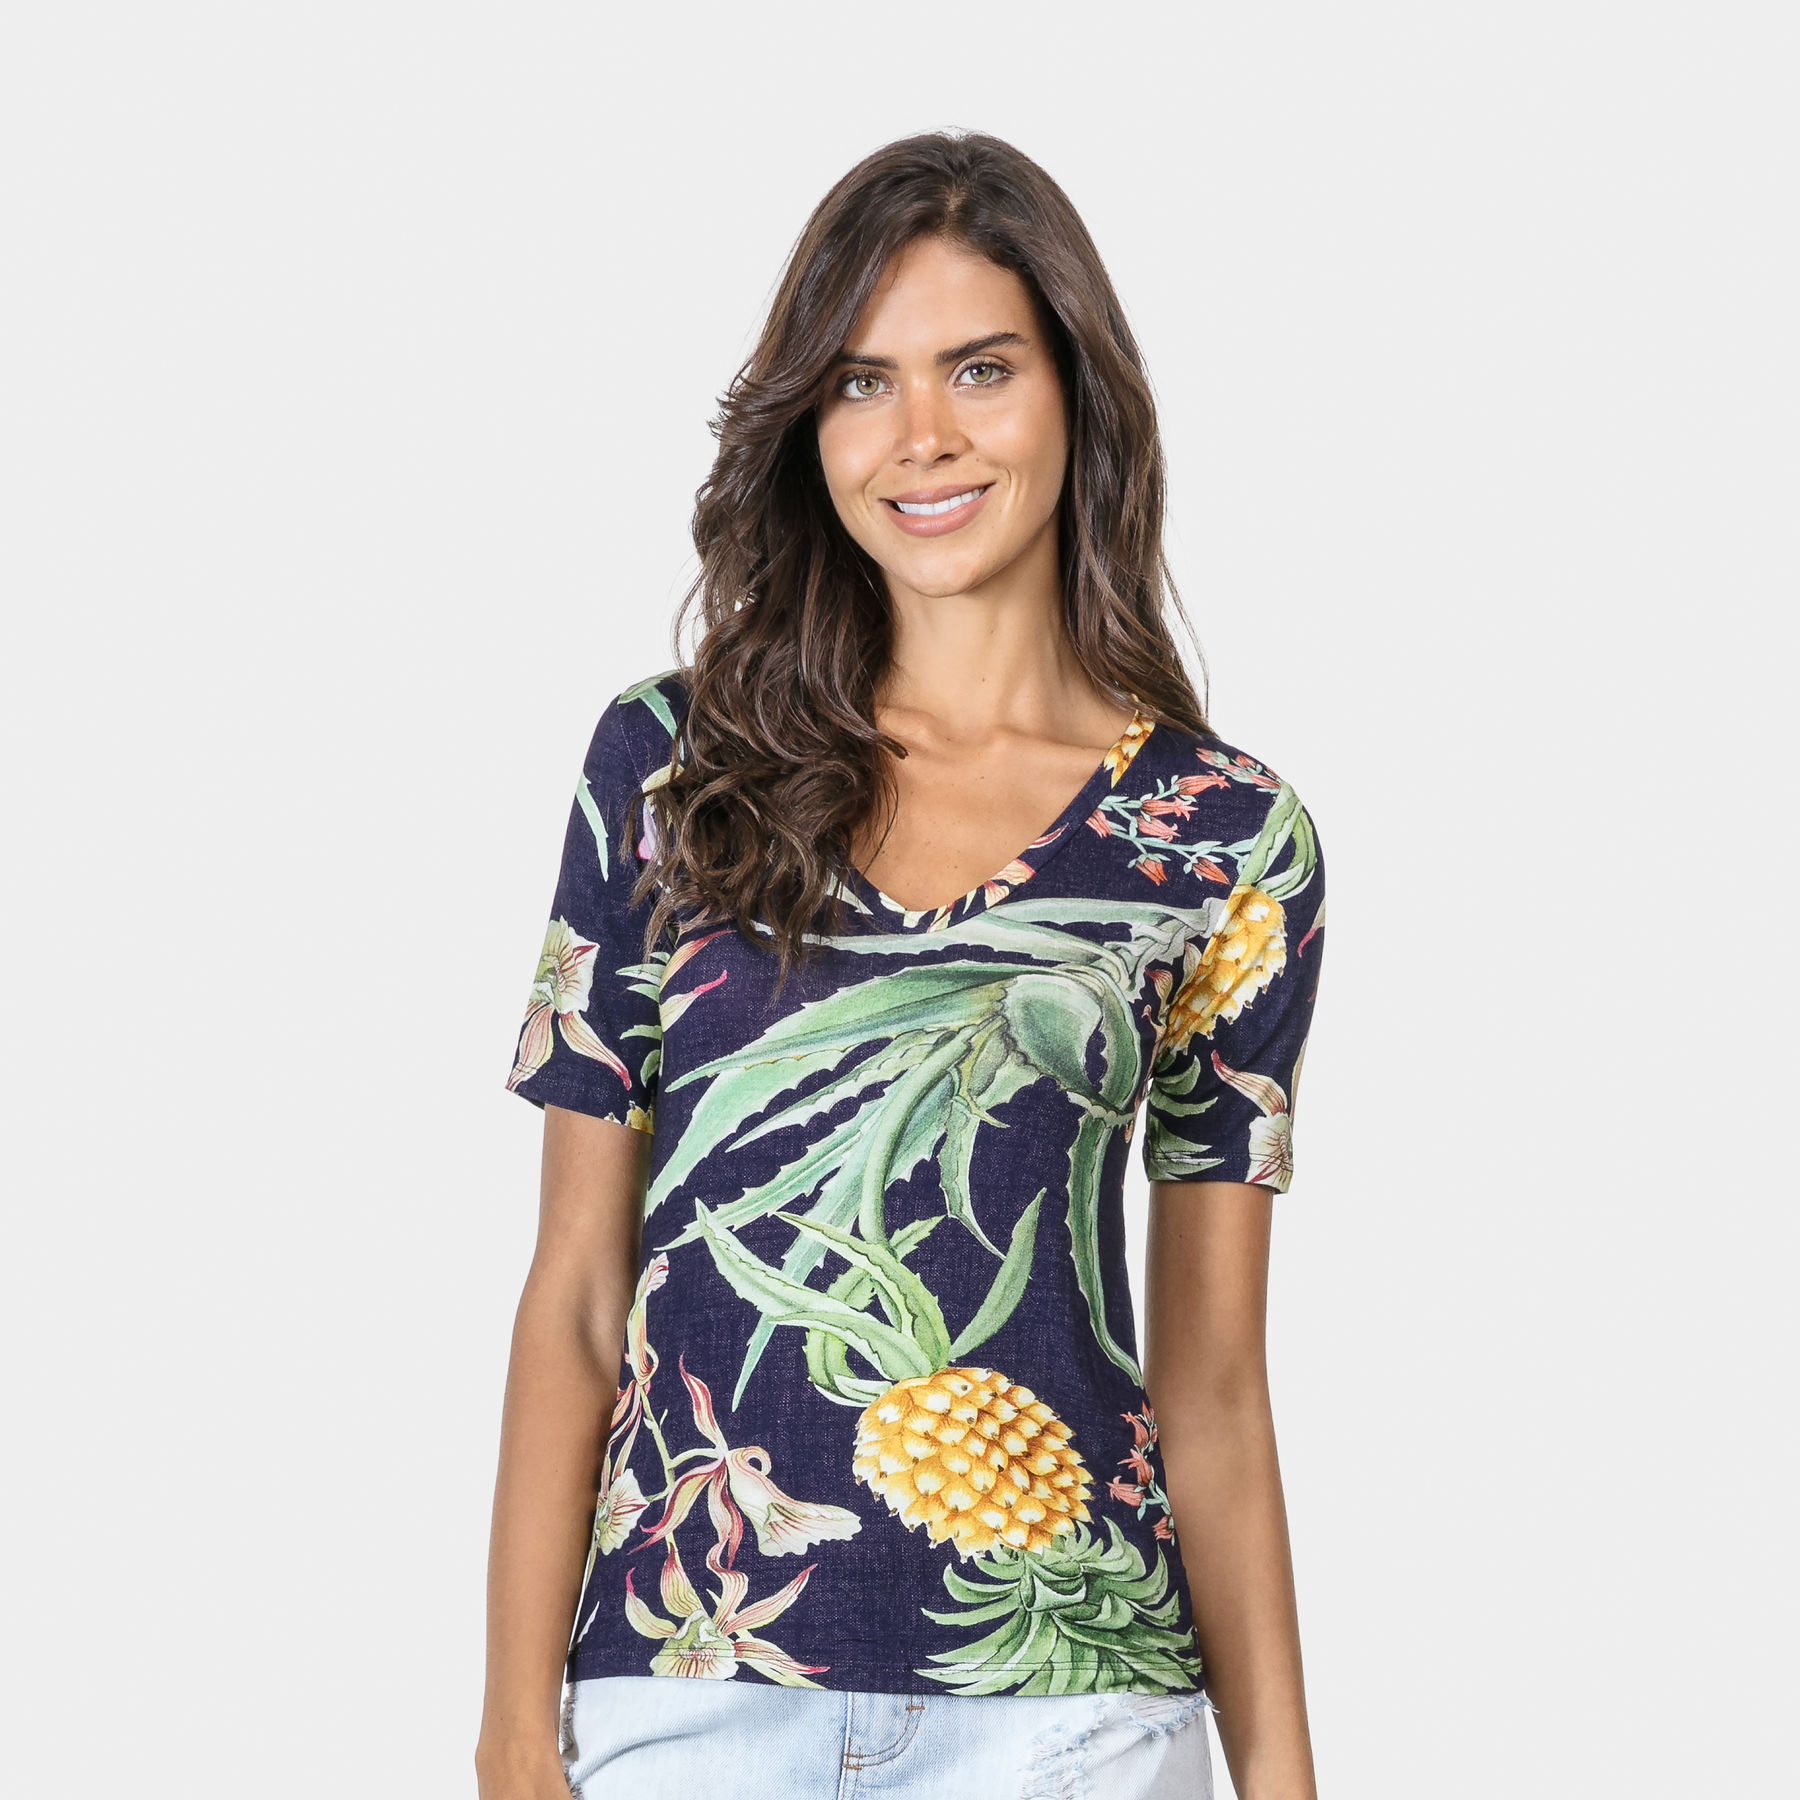 54a31a4f03bb Blusa Estampada Decote V Malha Aloe - Lez a Lez